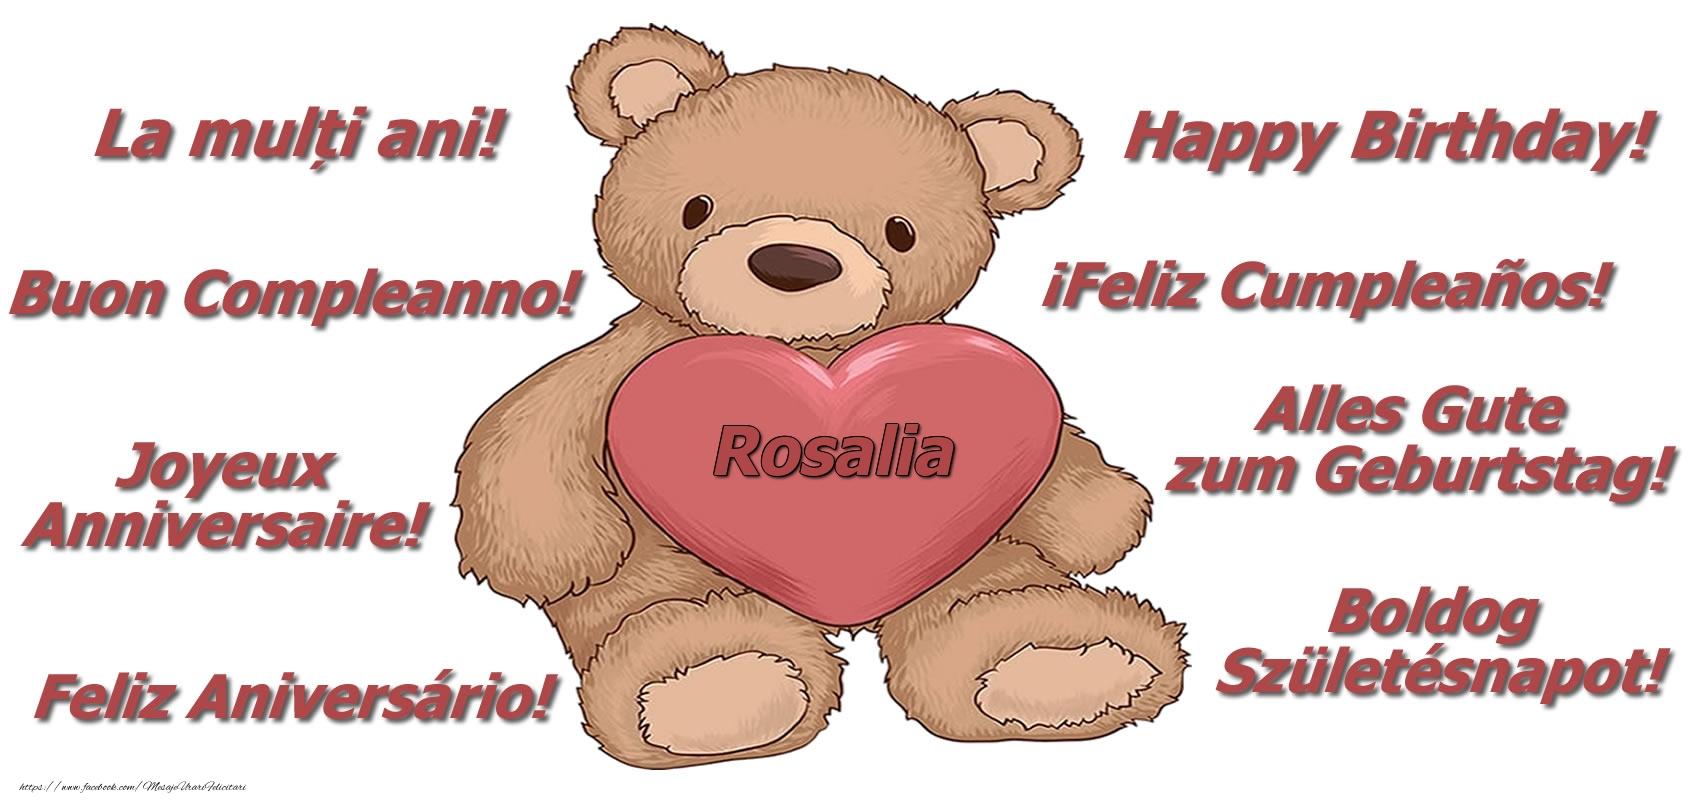 Felicitari de zi de nastere - La multi ani Rosalia! - Ursulet